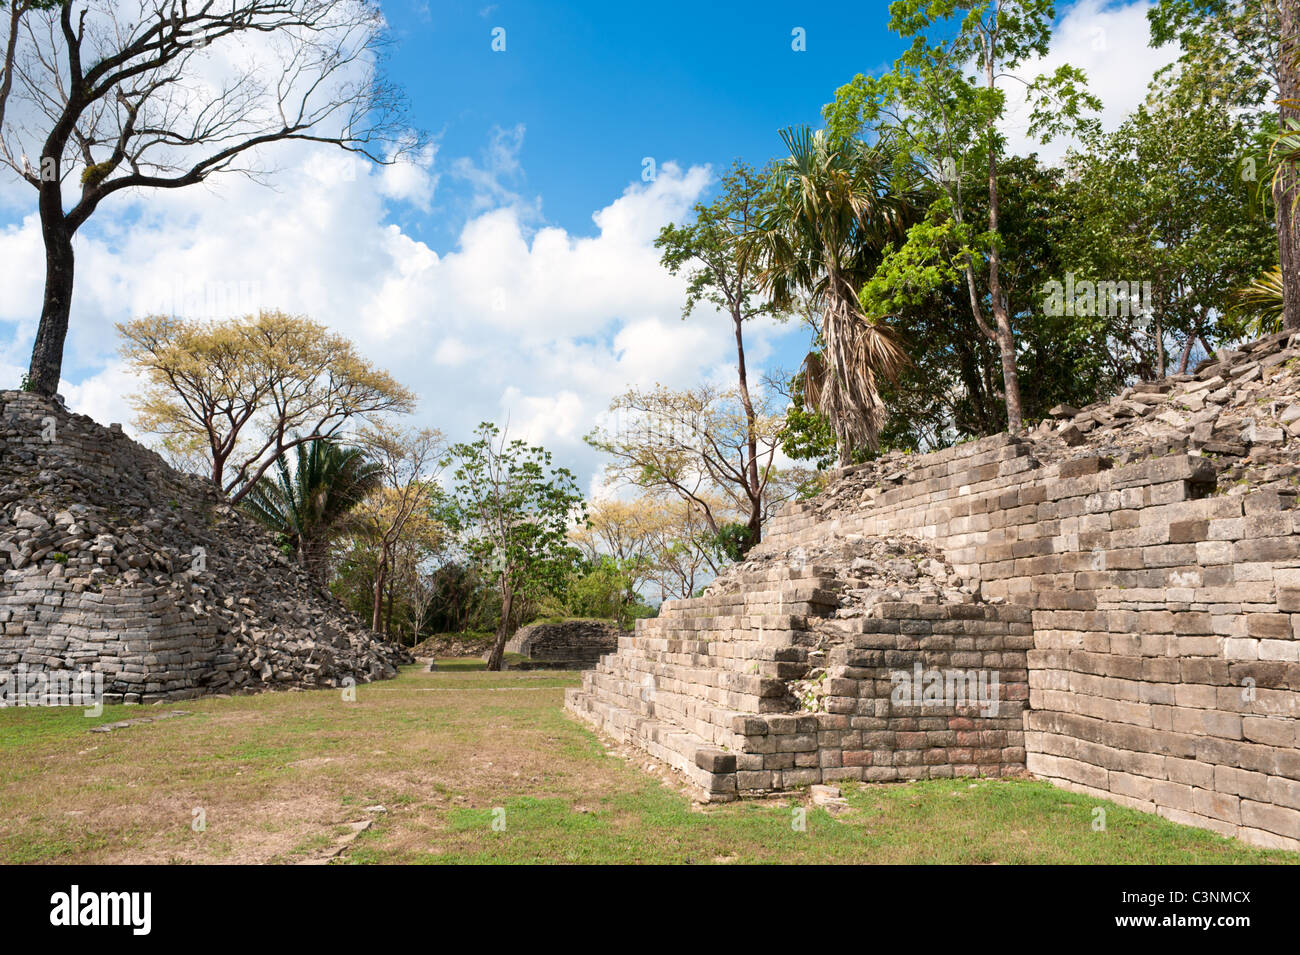 Maya ruins, Lubaantum, Belize. - Stock Image